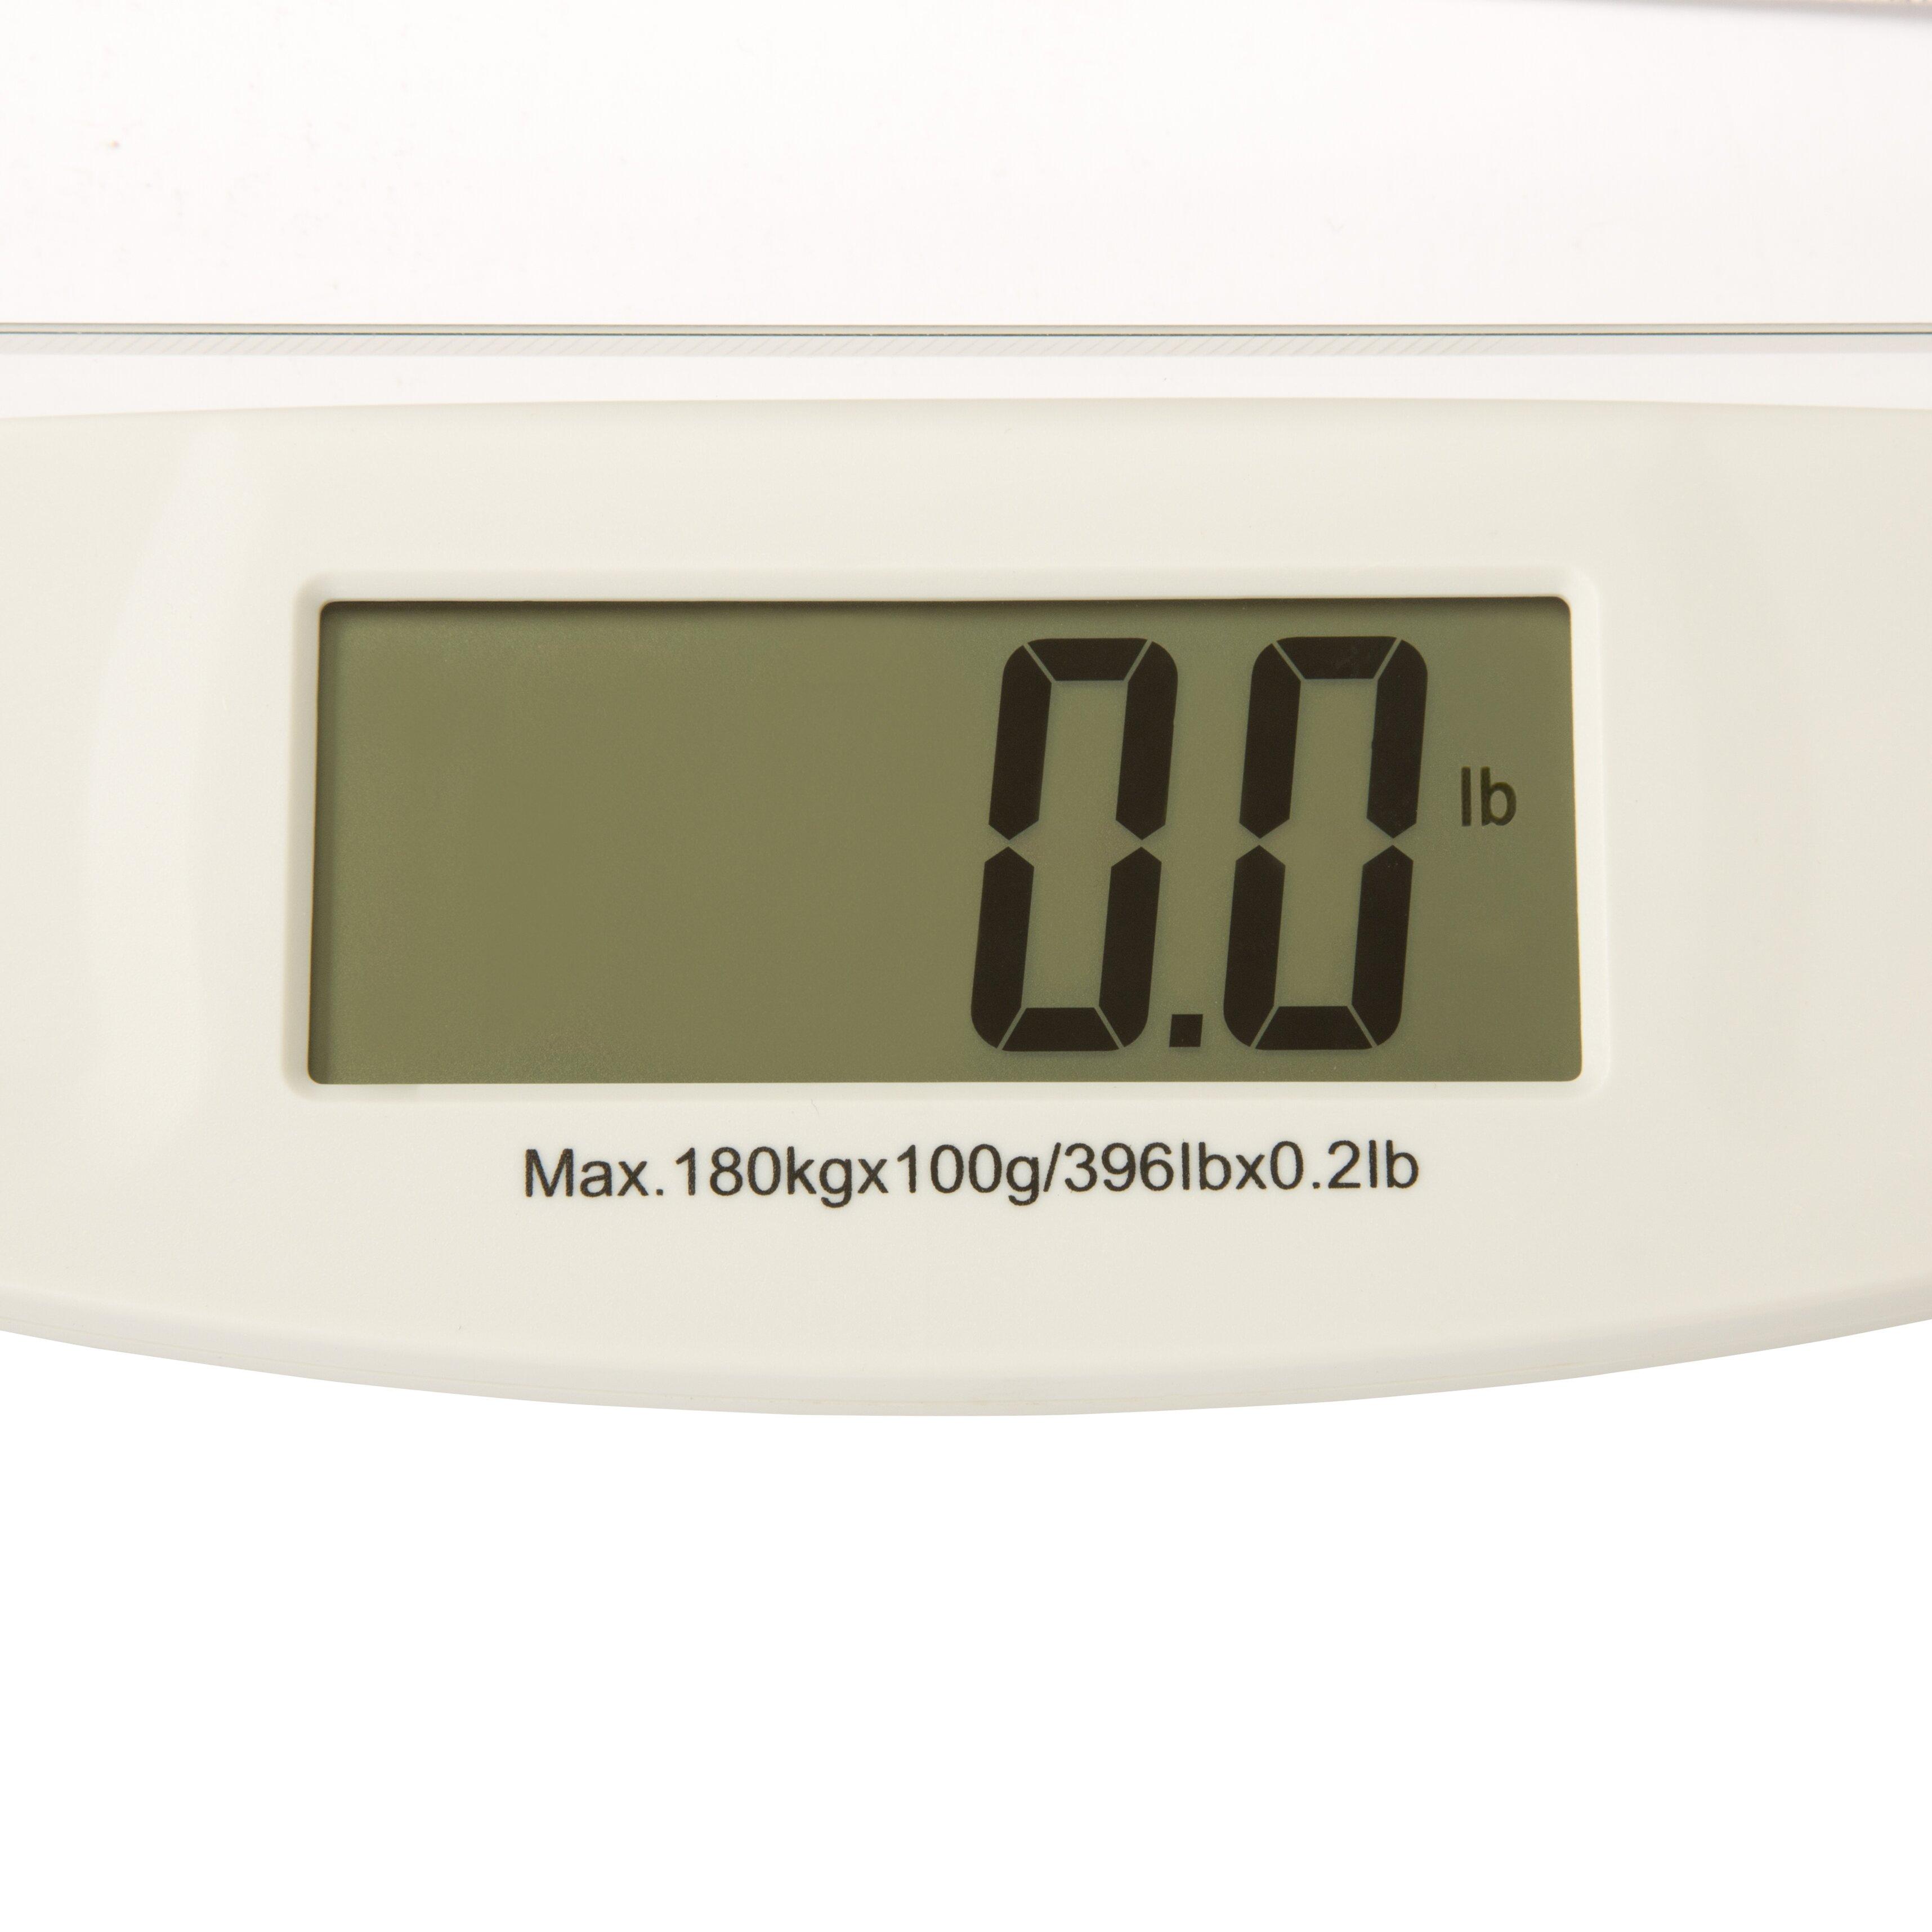 Bluestone Digital Glass Bathroom Scale with LCD Display. Bluestone Digital Glass Bathroom Scale with LCD Display  amp  Reviews